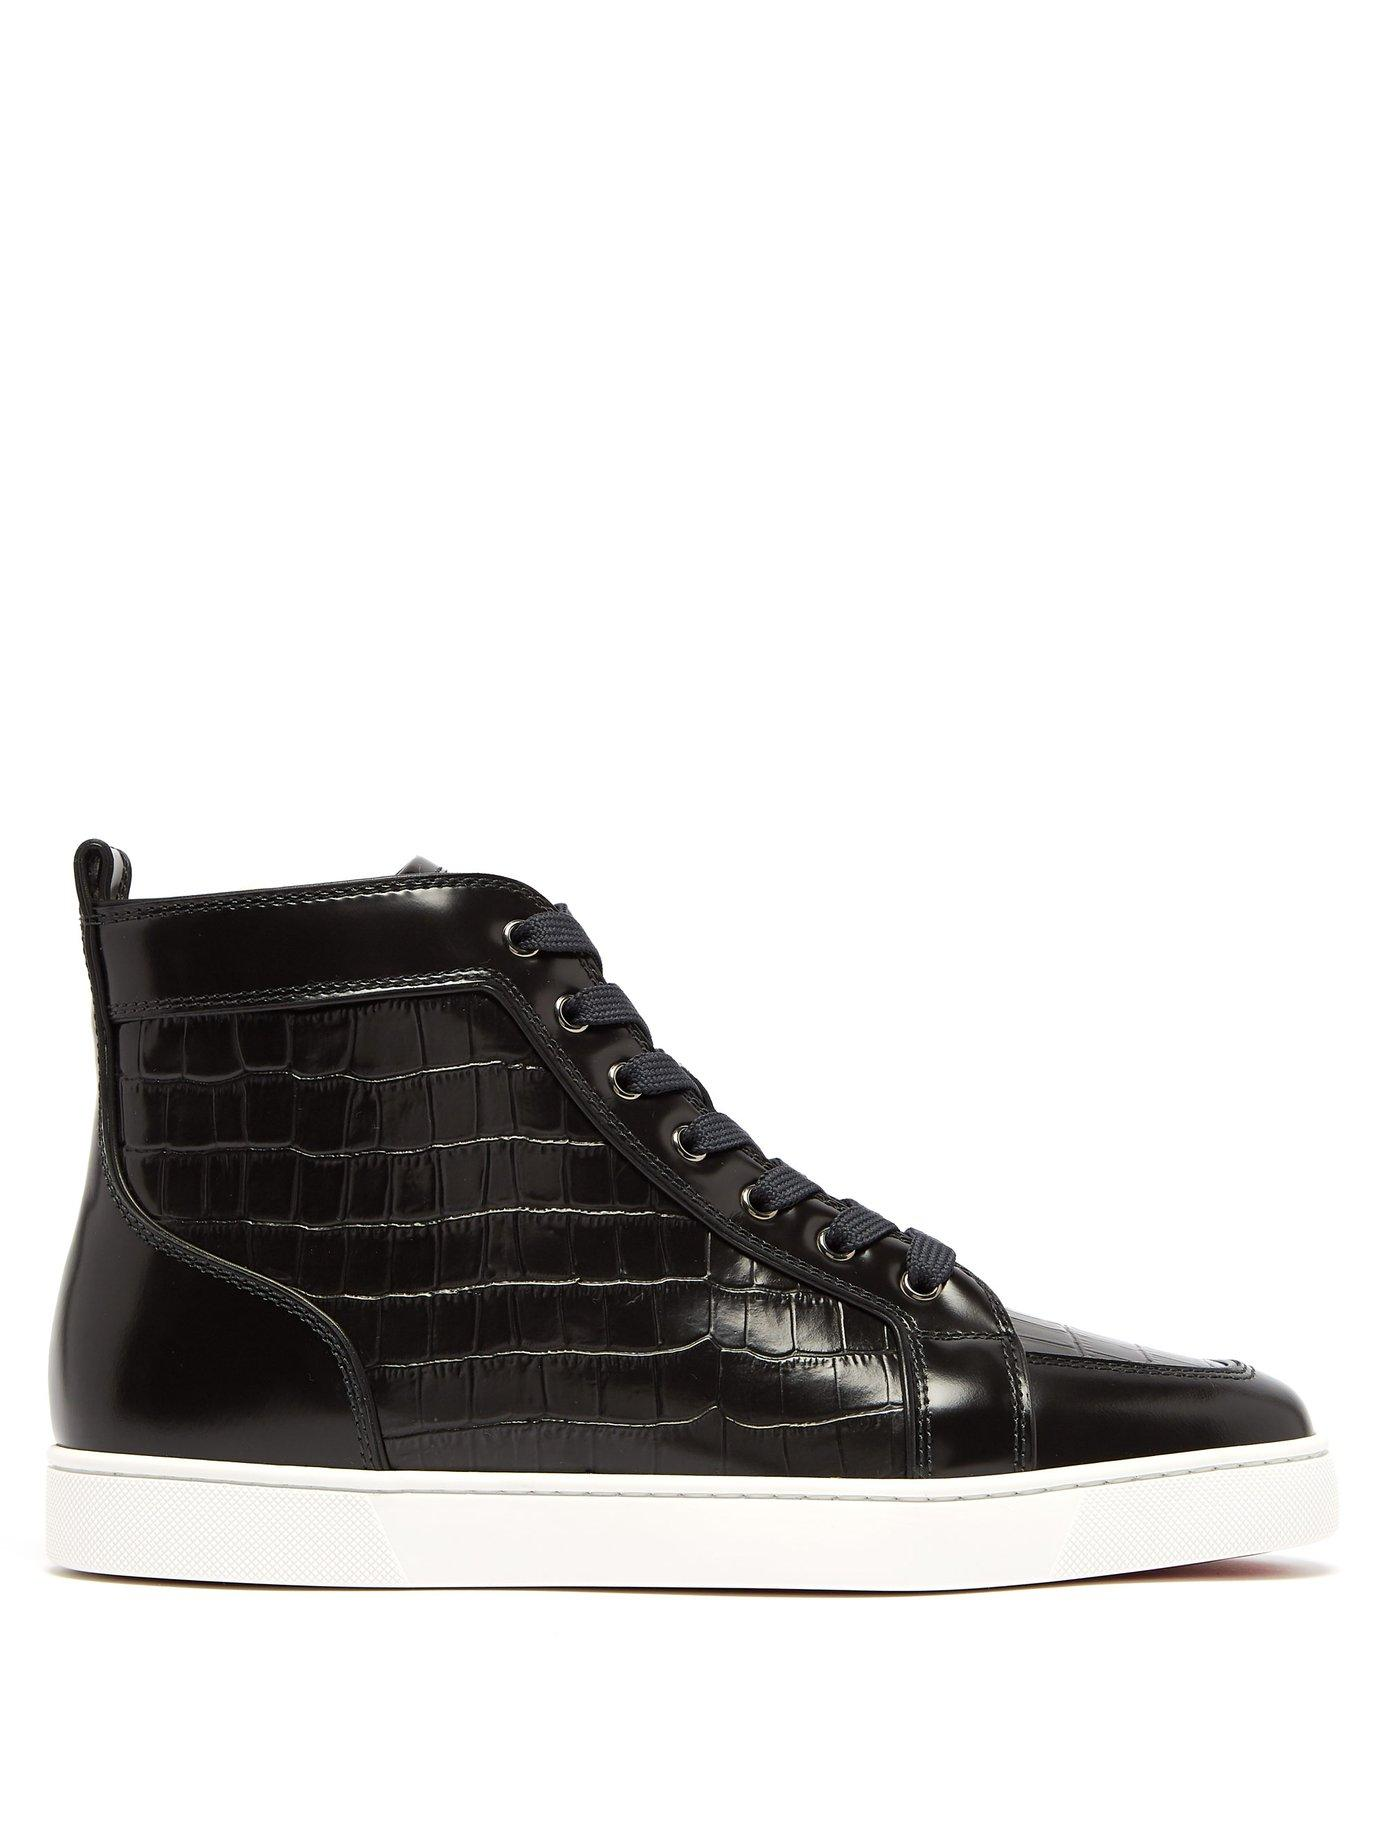 promo code aa8d6 77ffe Men's Black Rantus Crocodile Effect High Top Leather Sneakers